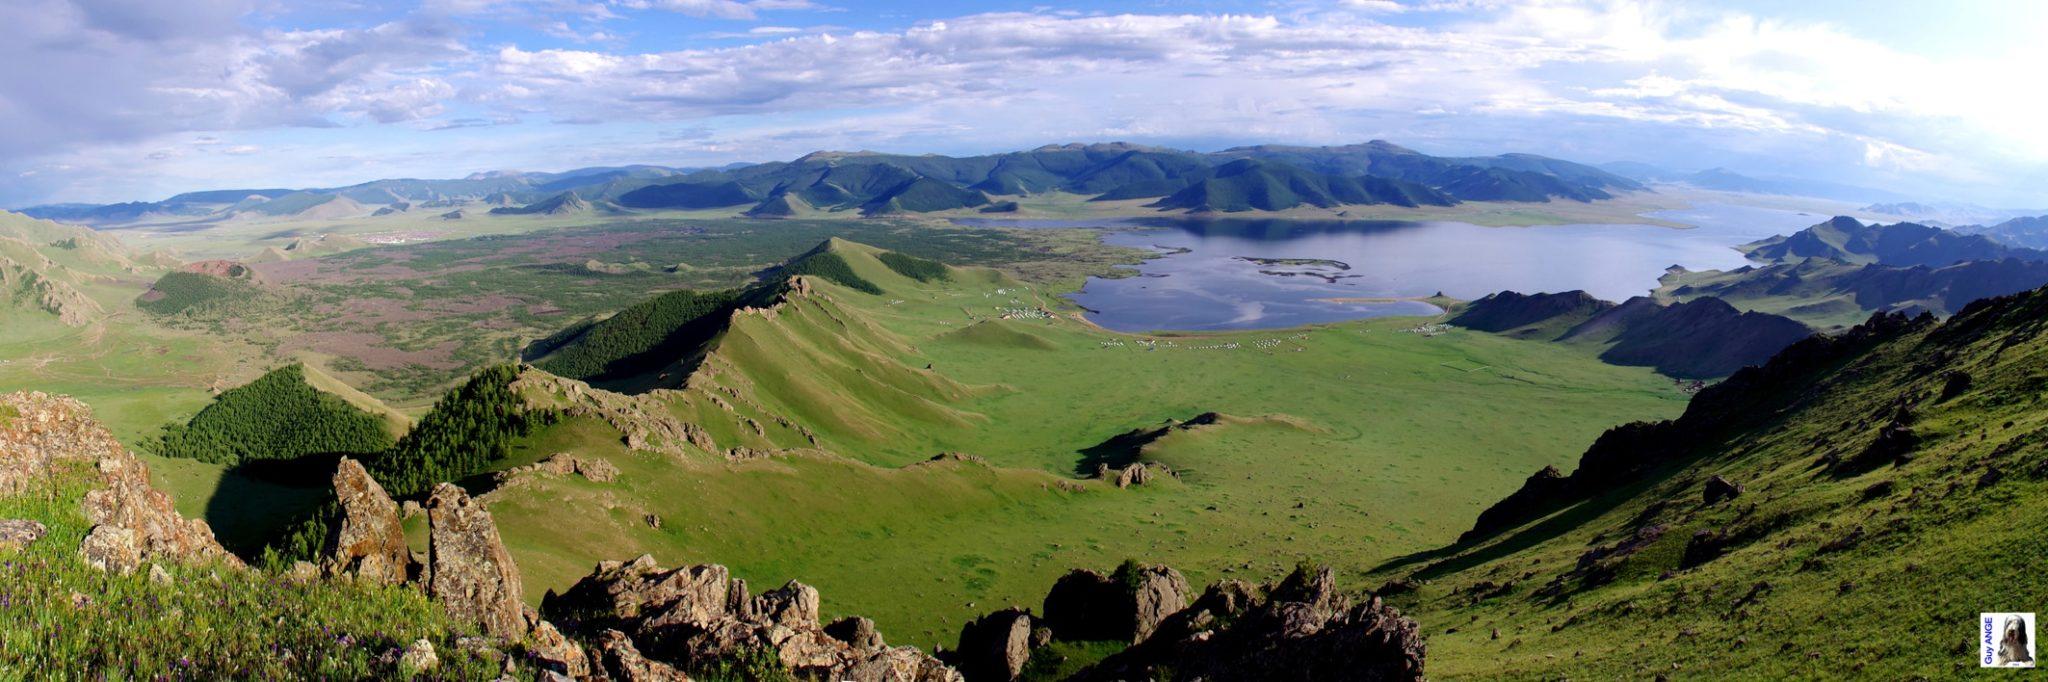 Parc Naturel de Terkhiin Tsagaan Nuur.